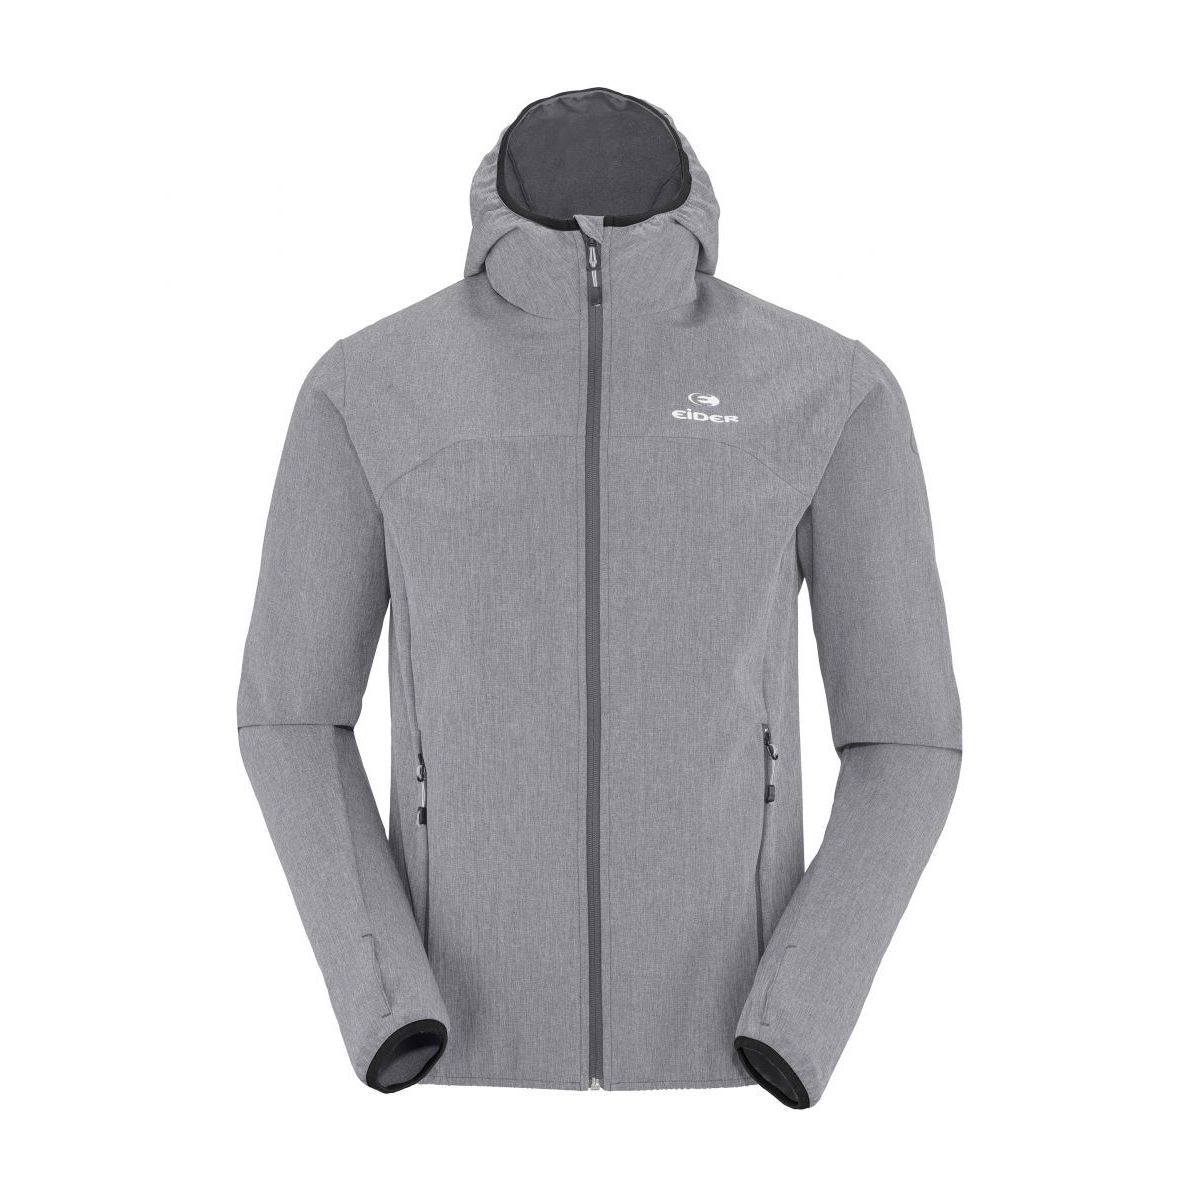 Eider Power Hoodie Jacket